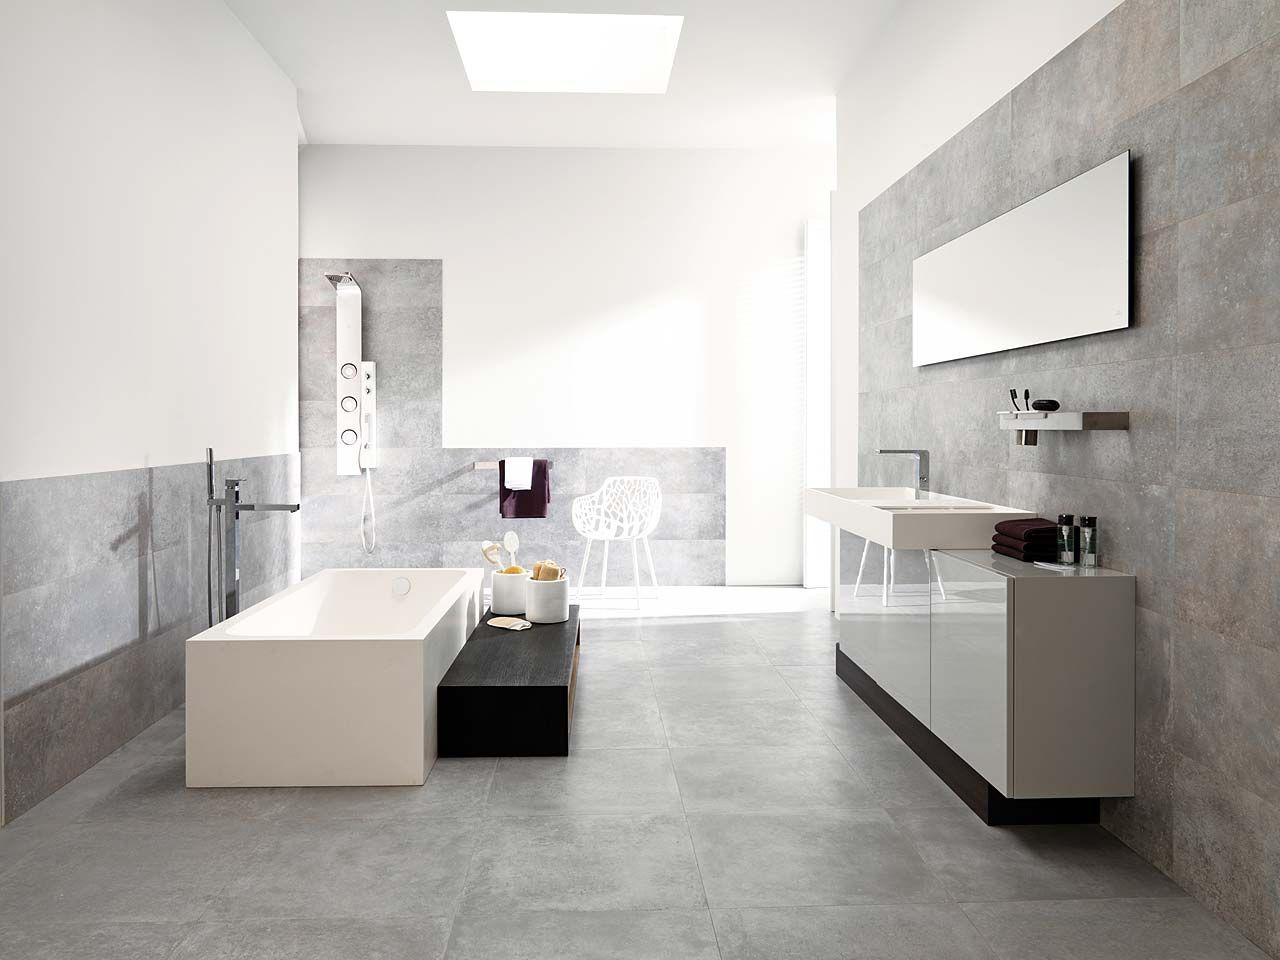 Simple modern bathroom with porcelanosas beautiful grey ceramic simple modern bathroom with porcelanosas beautiful grey ceramic tiles floor tiles ston ker dailygadgetfo Gallery